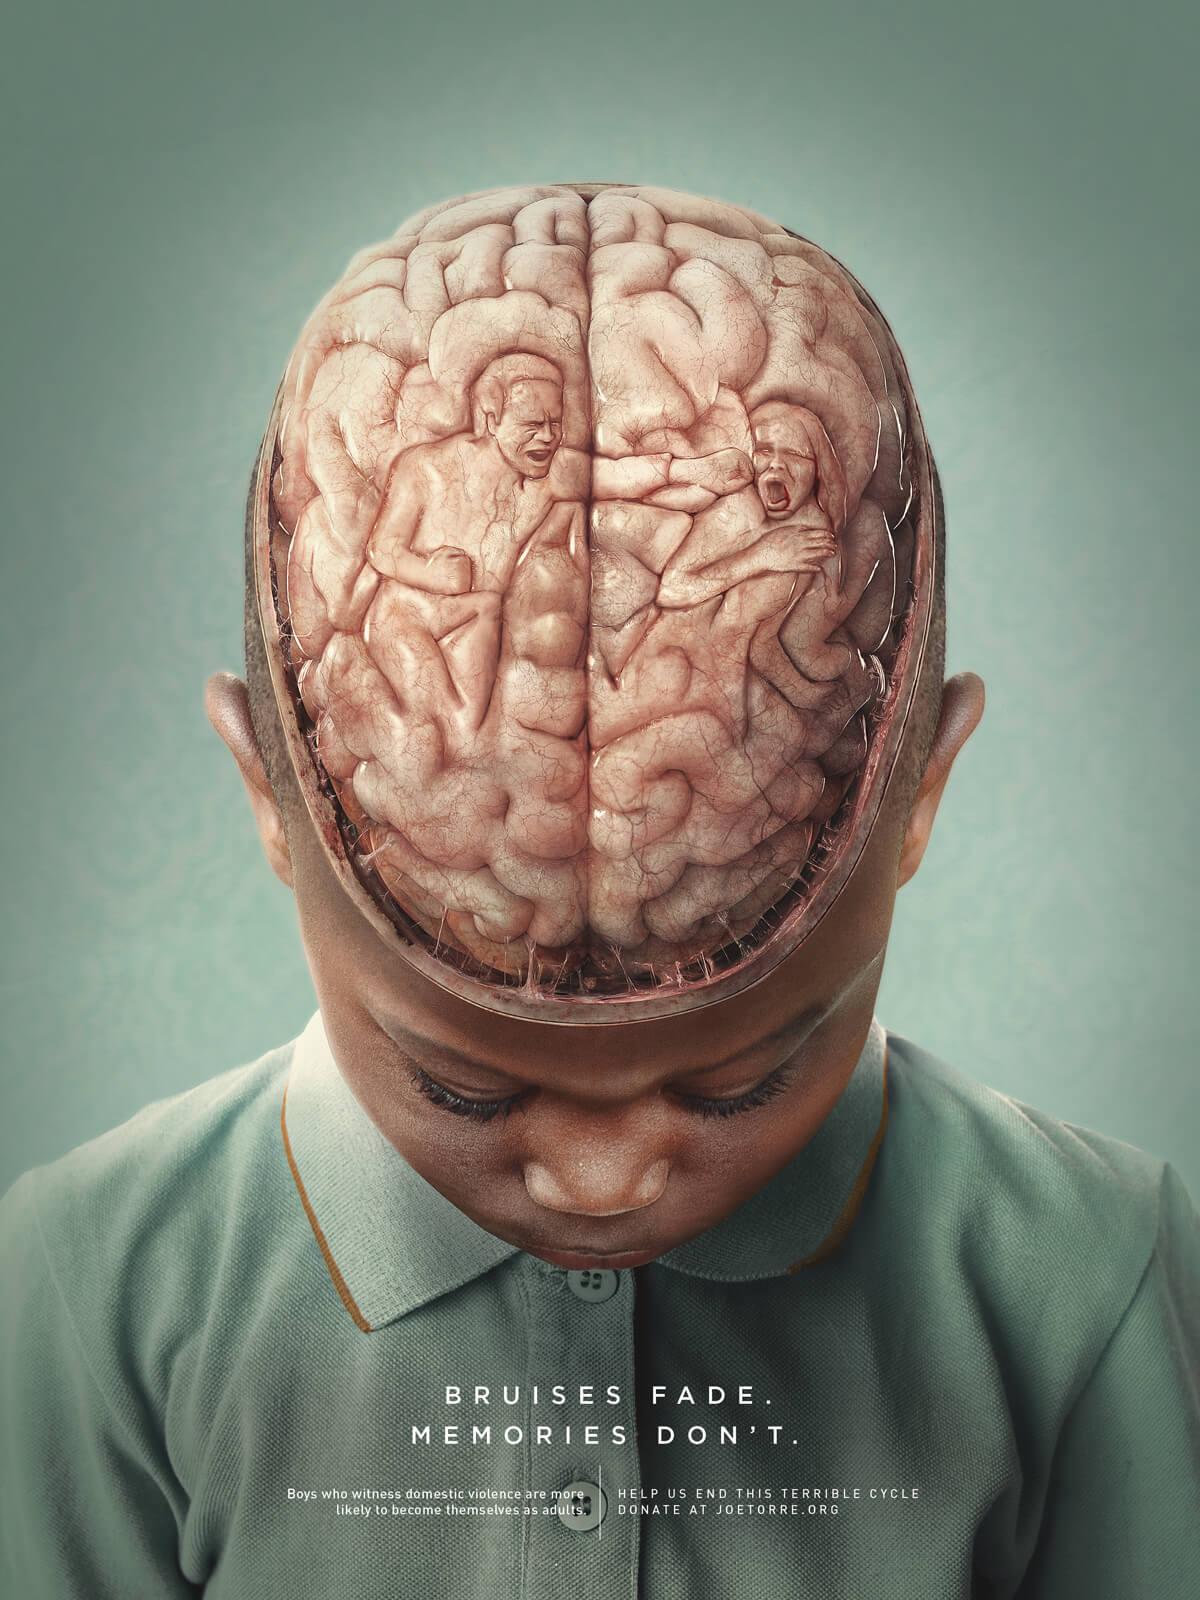 sah_brain-wsj_layouts013.jpg